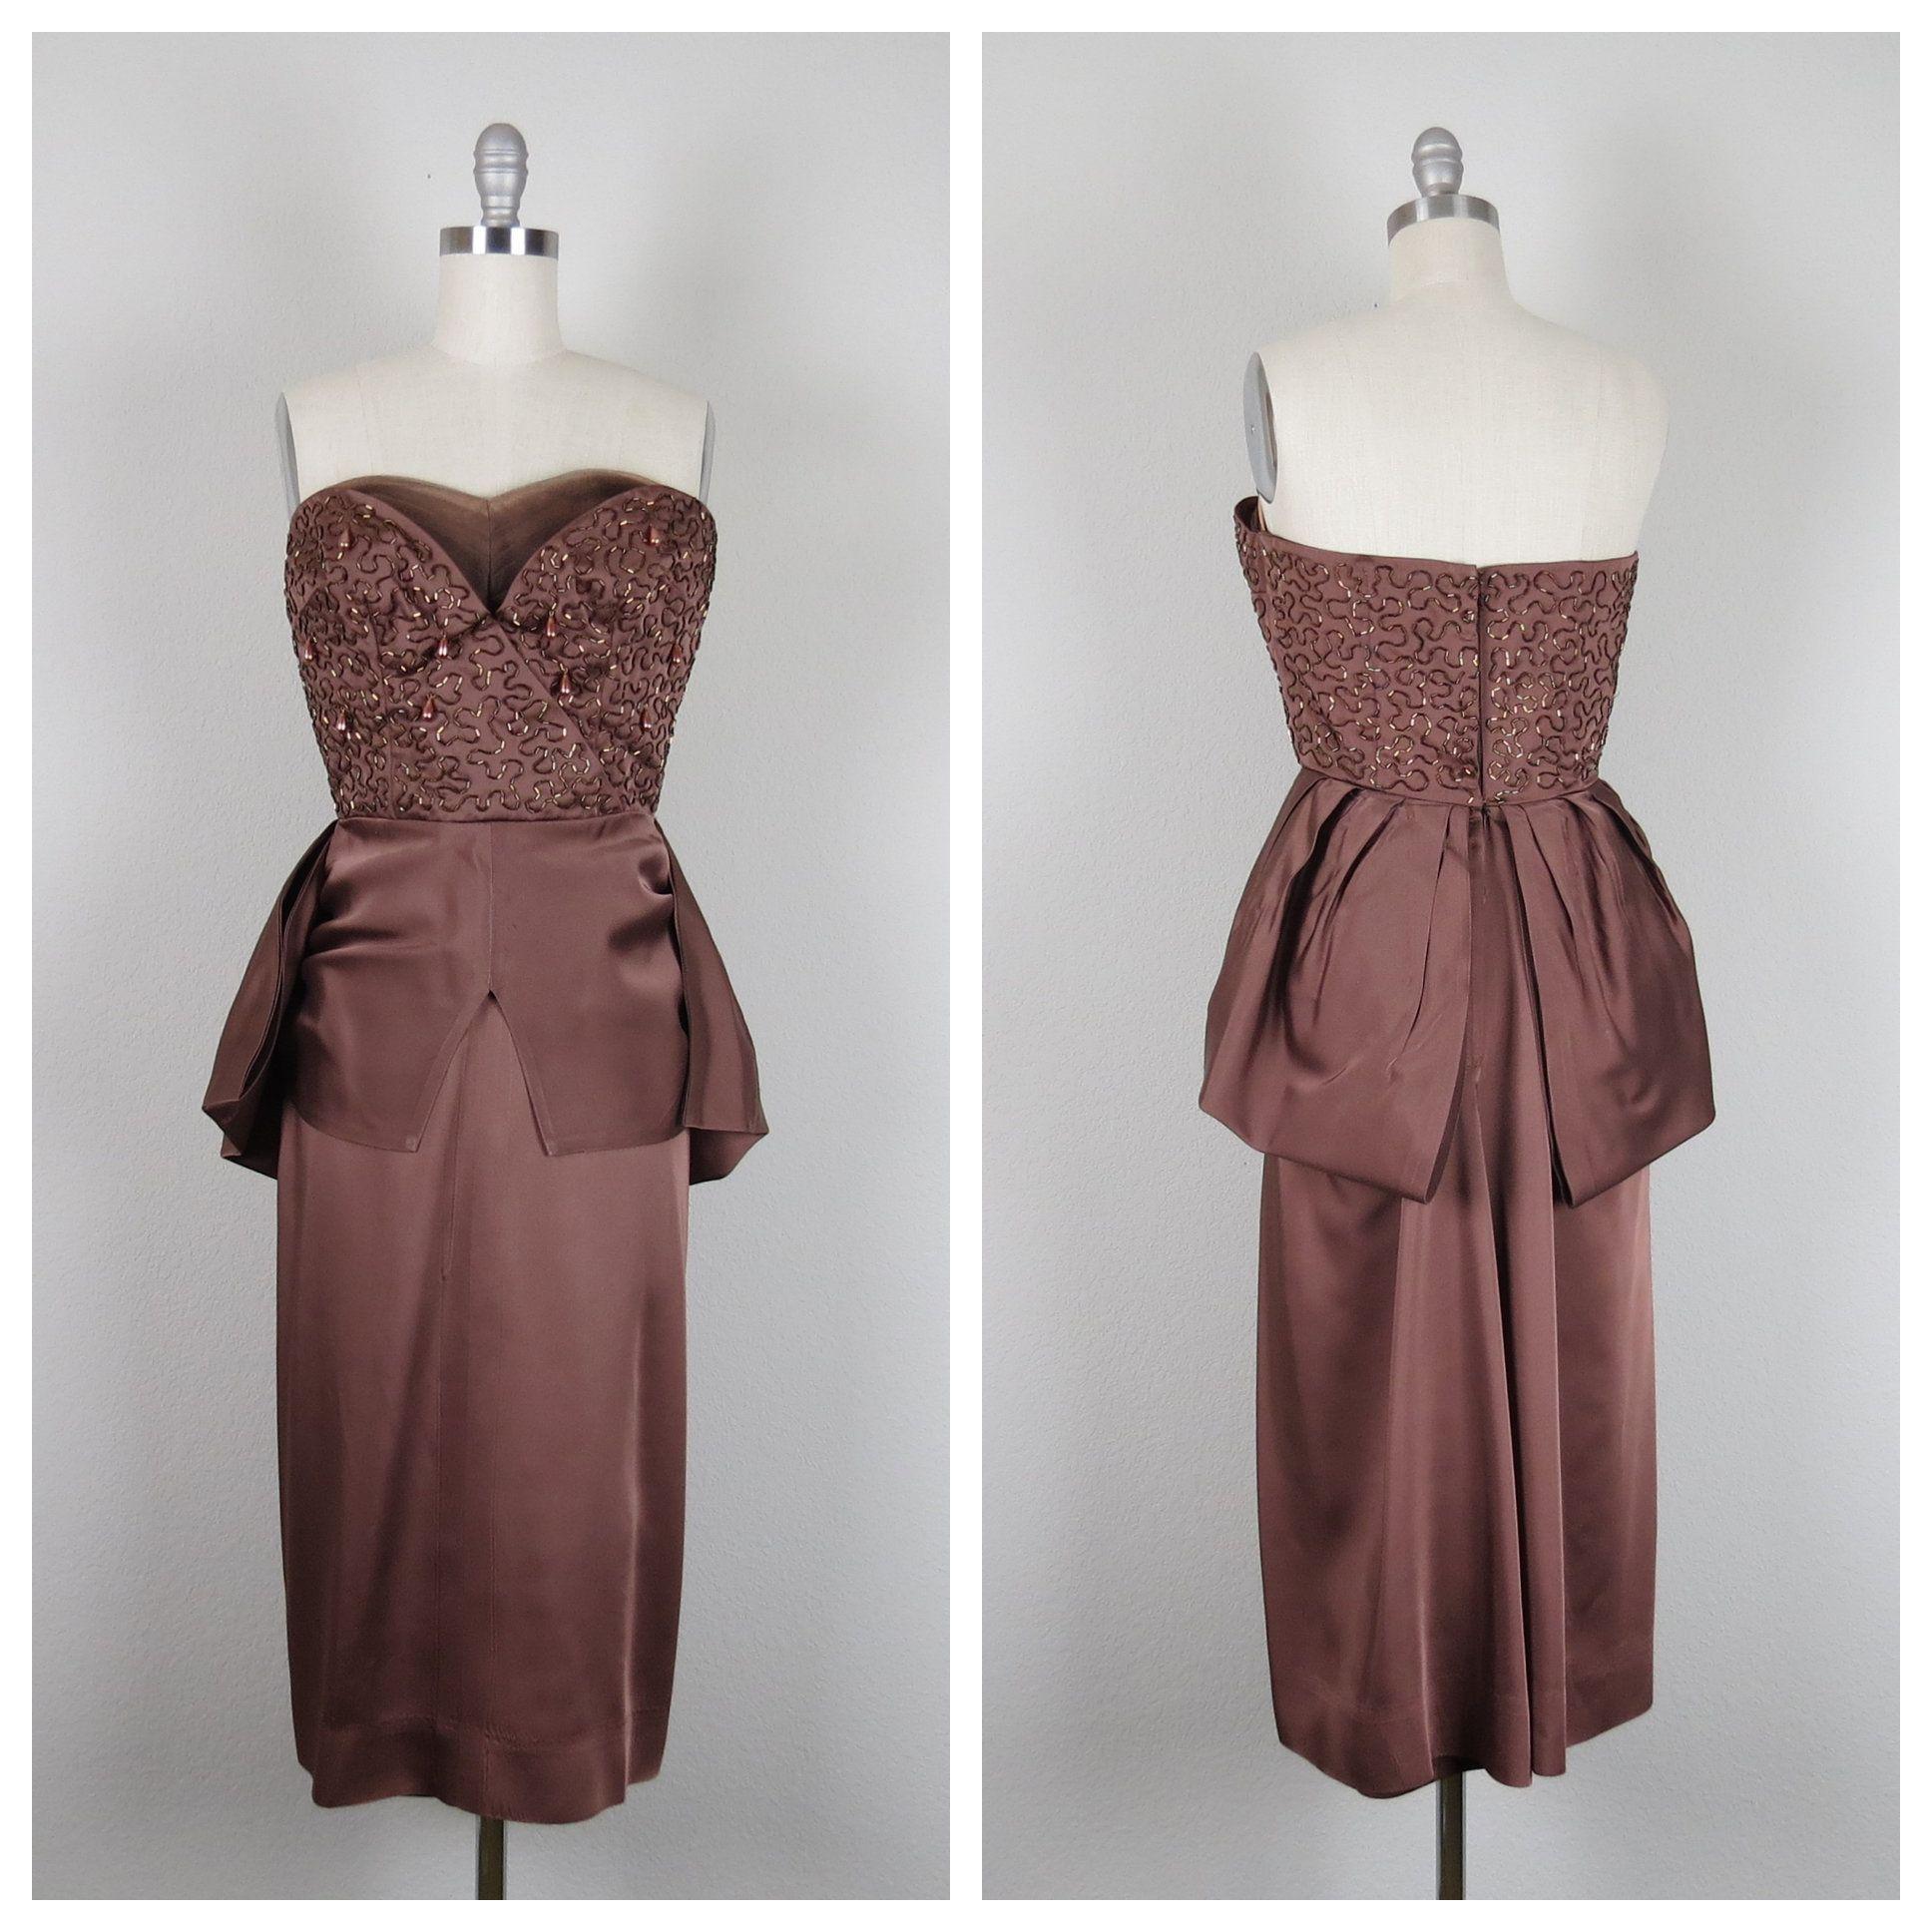 Vintage 1950s satin beaded strapless cocktail dress size